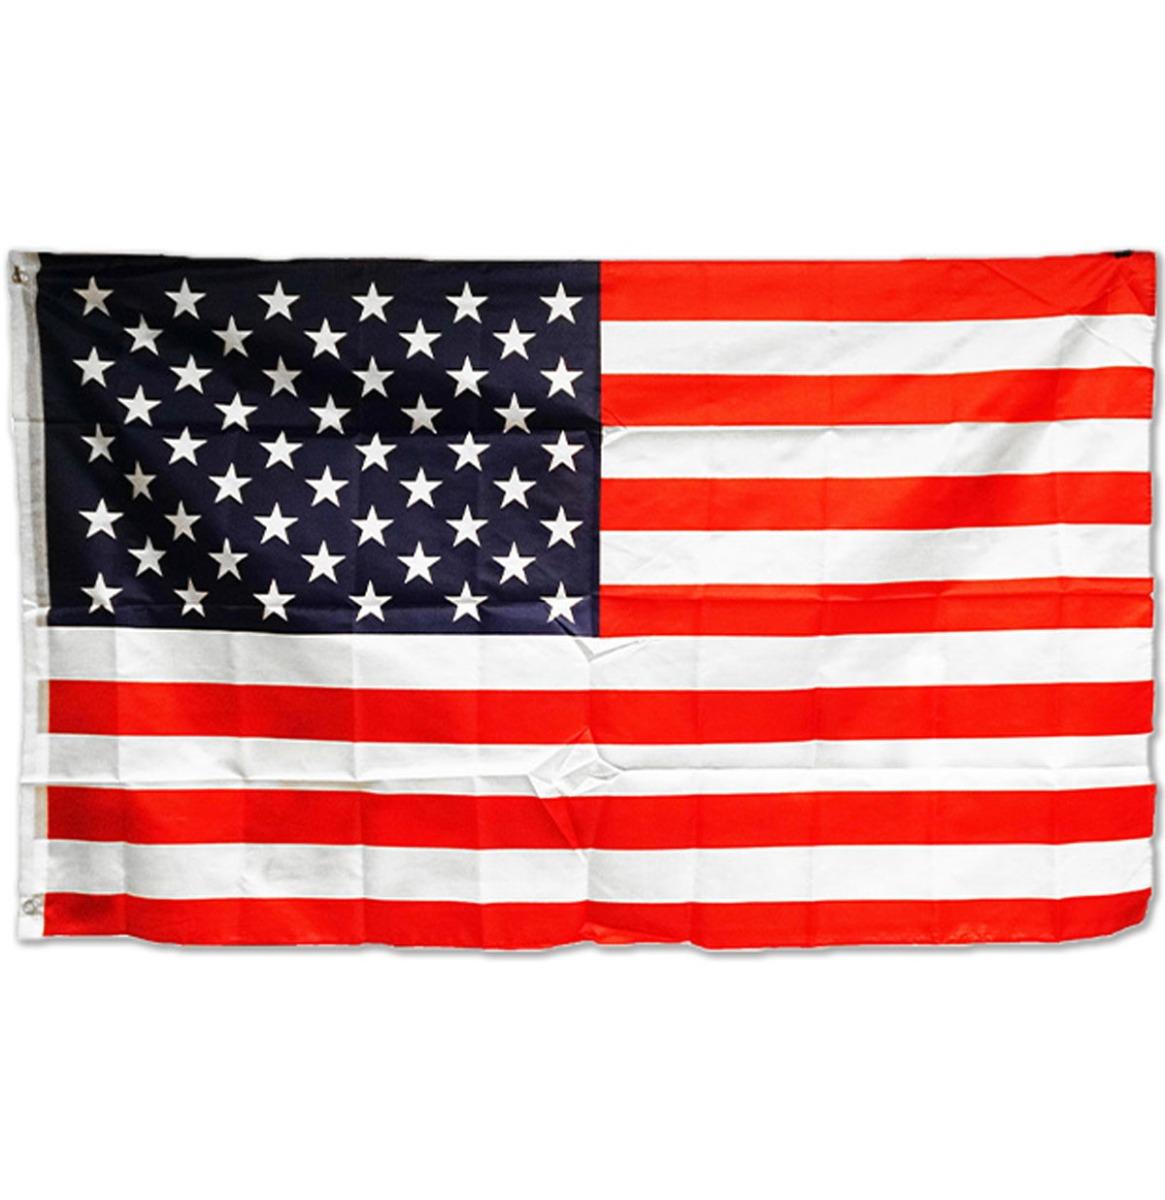 Amerikaanse Vlag - 91,5 x 152,5 cm